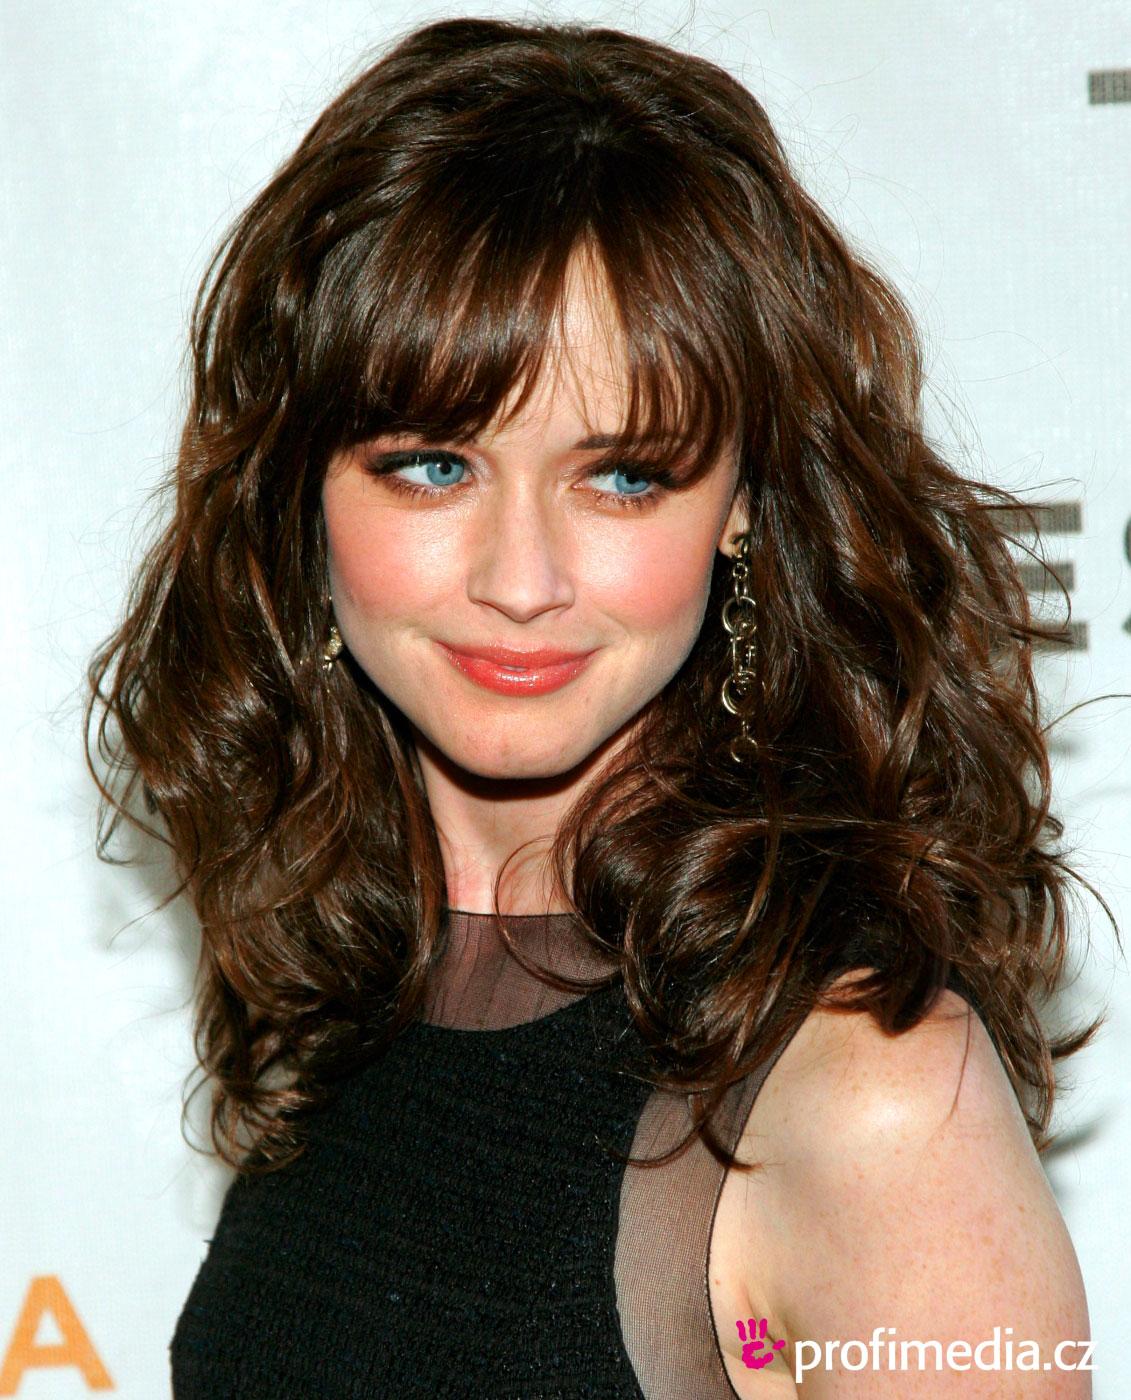 Hairstyles Wallpaper: Celebrity Alexis Bledel Long Wavy Hairstyle Wallpaper